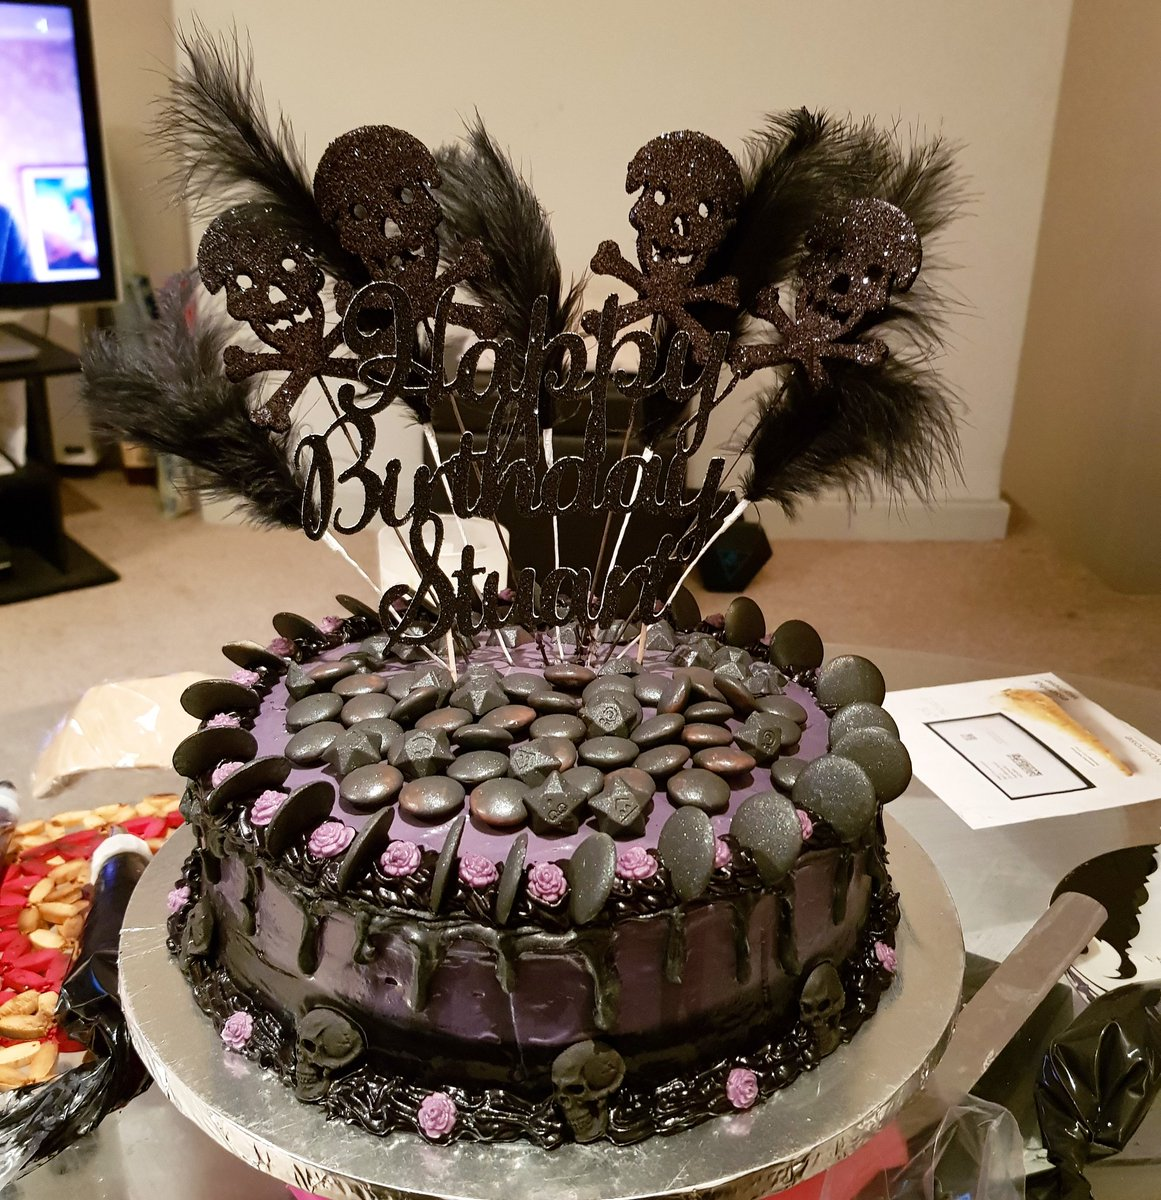 Swell Sanjna Suryavanshi On Twitter Goth Birthday Cake Made For My Funny Birthday Cards Online Inifofree Goldxyz